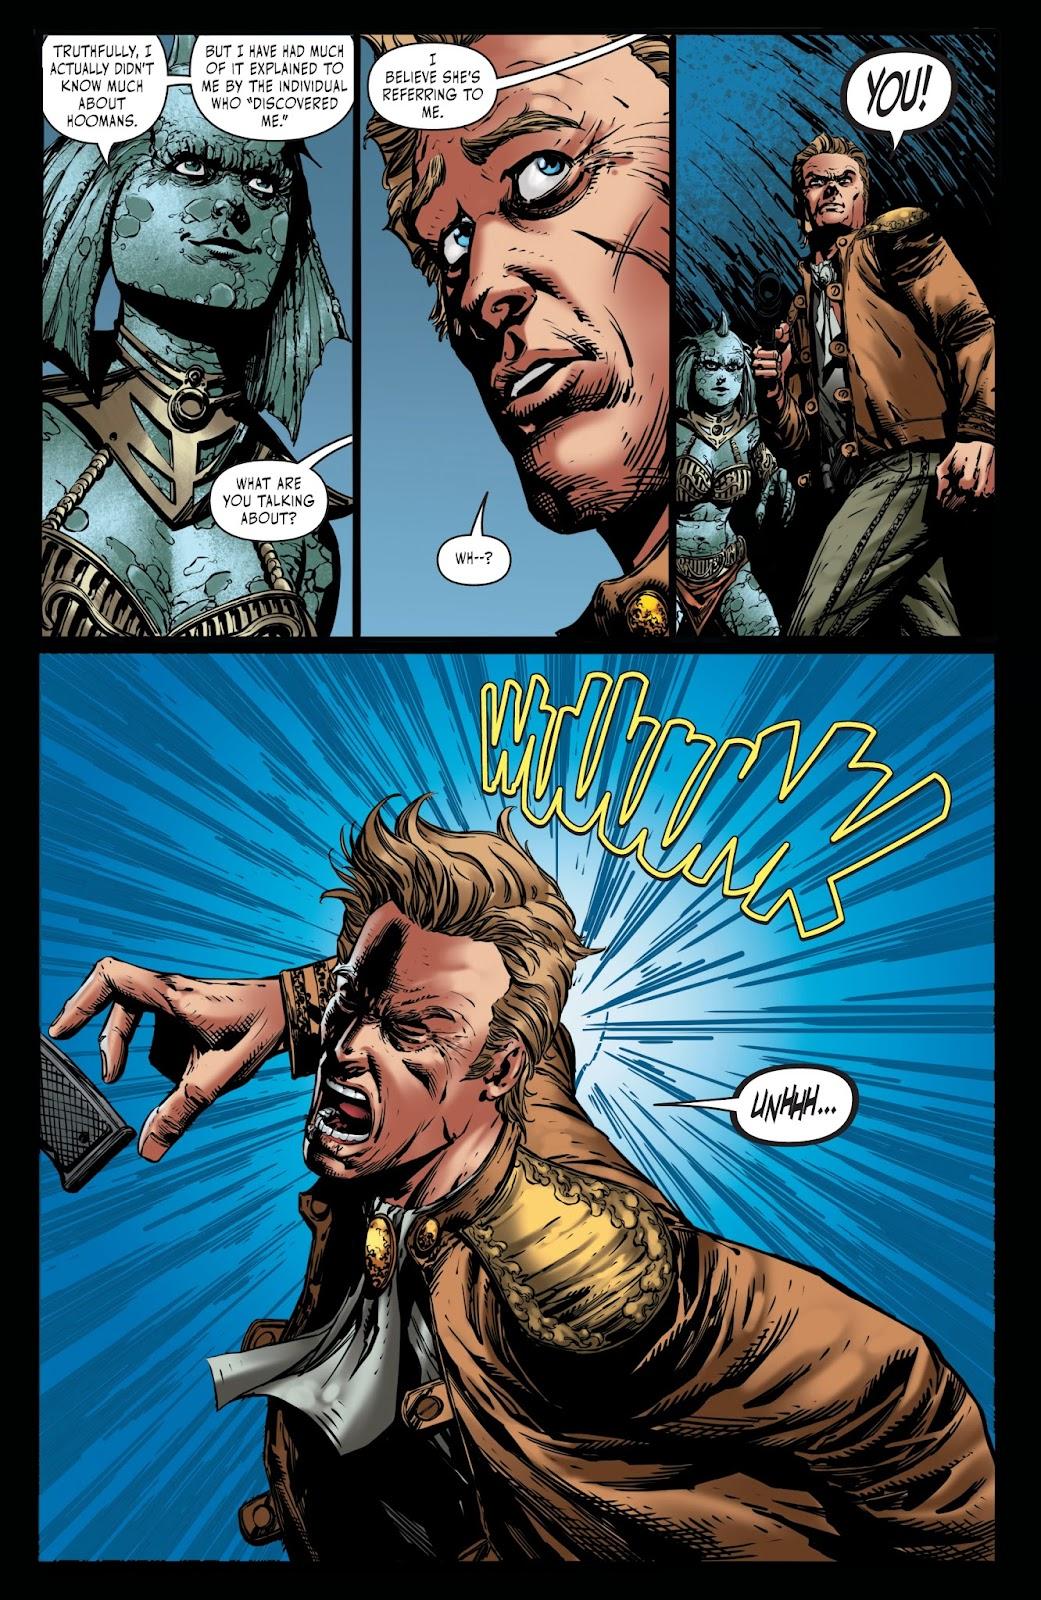 Battlestar Galactica BSG vs. BSG issue 1 - Page 18